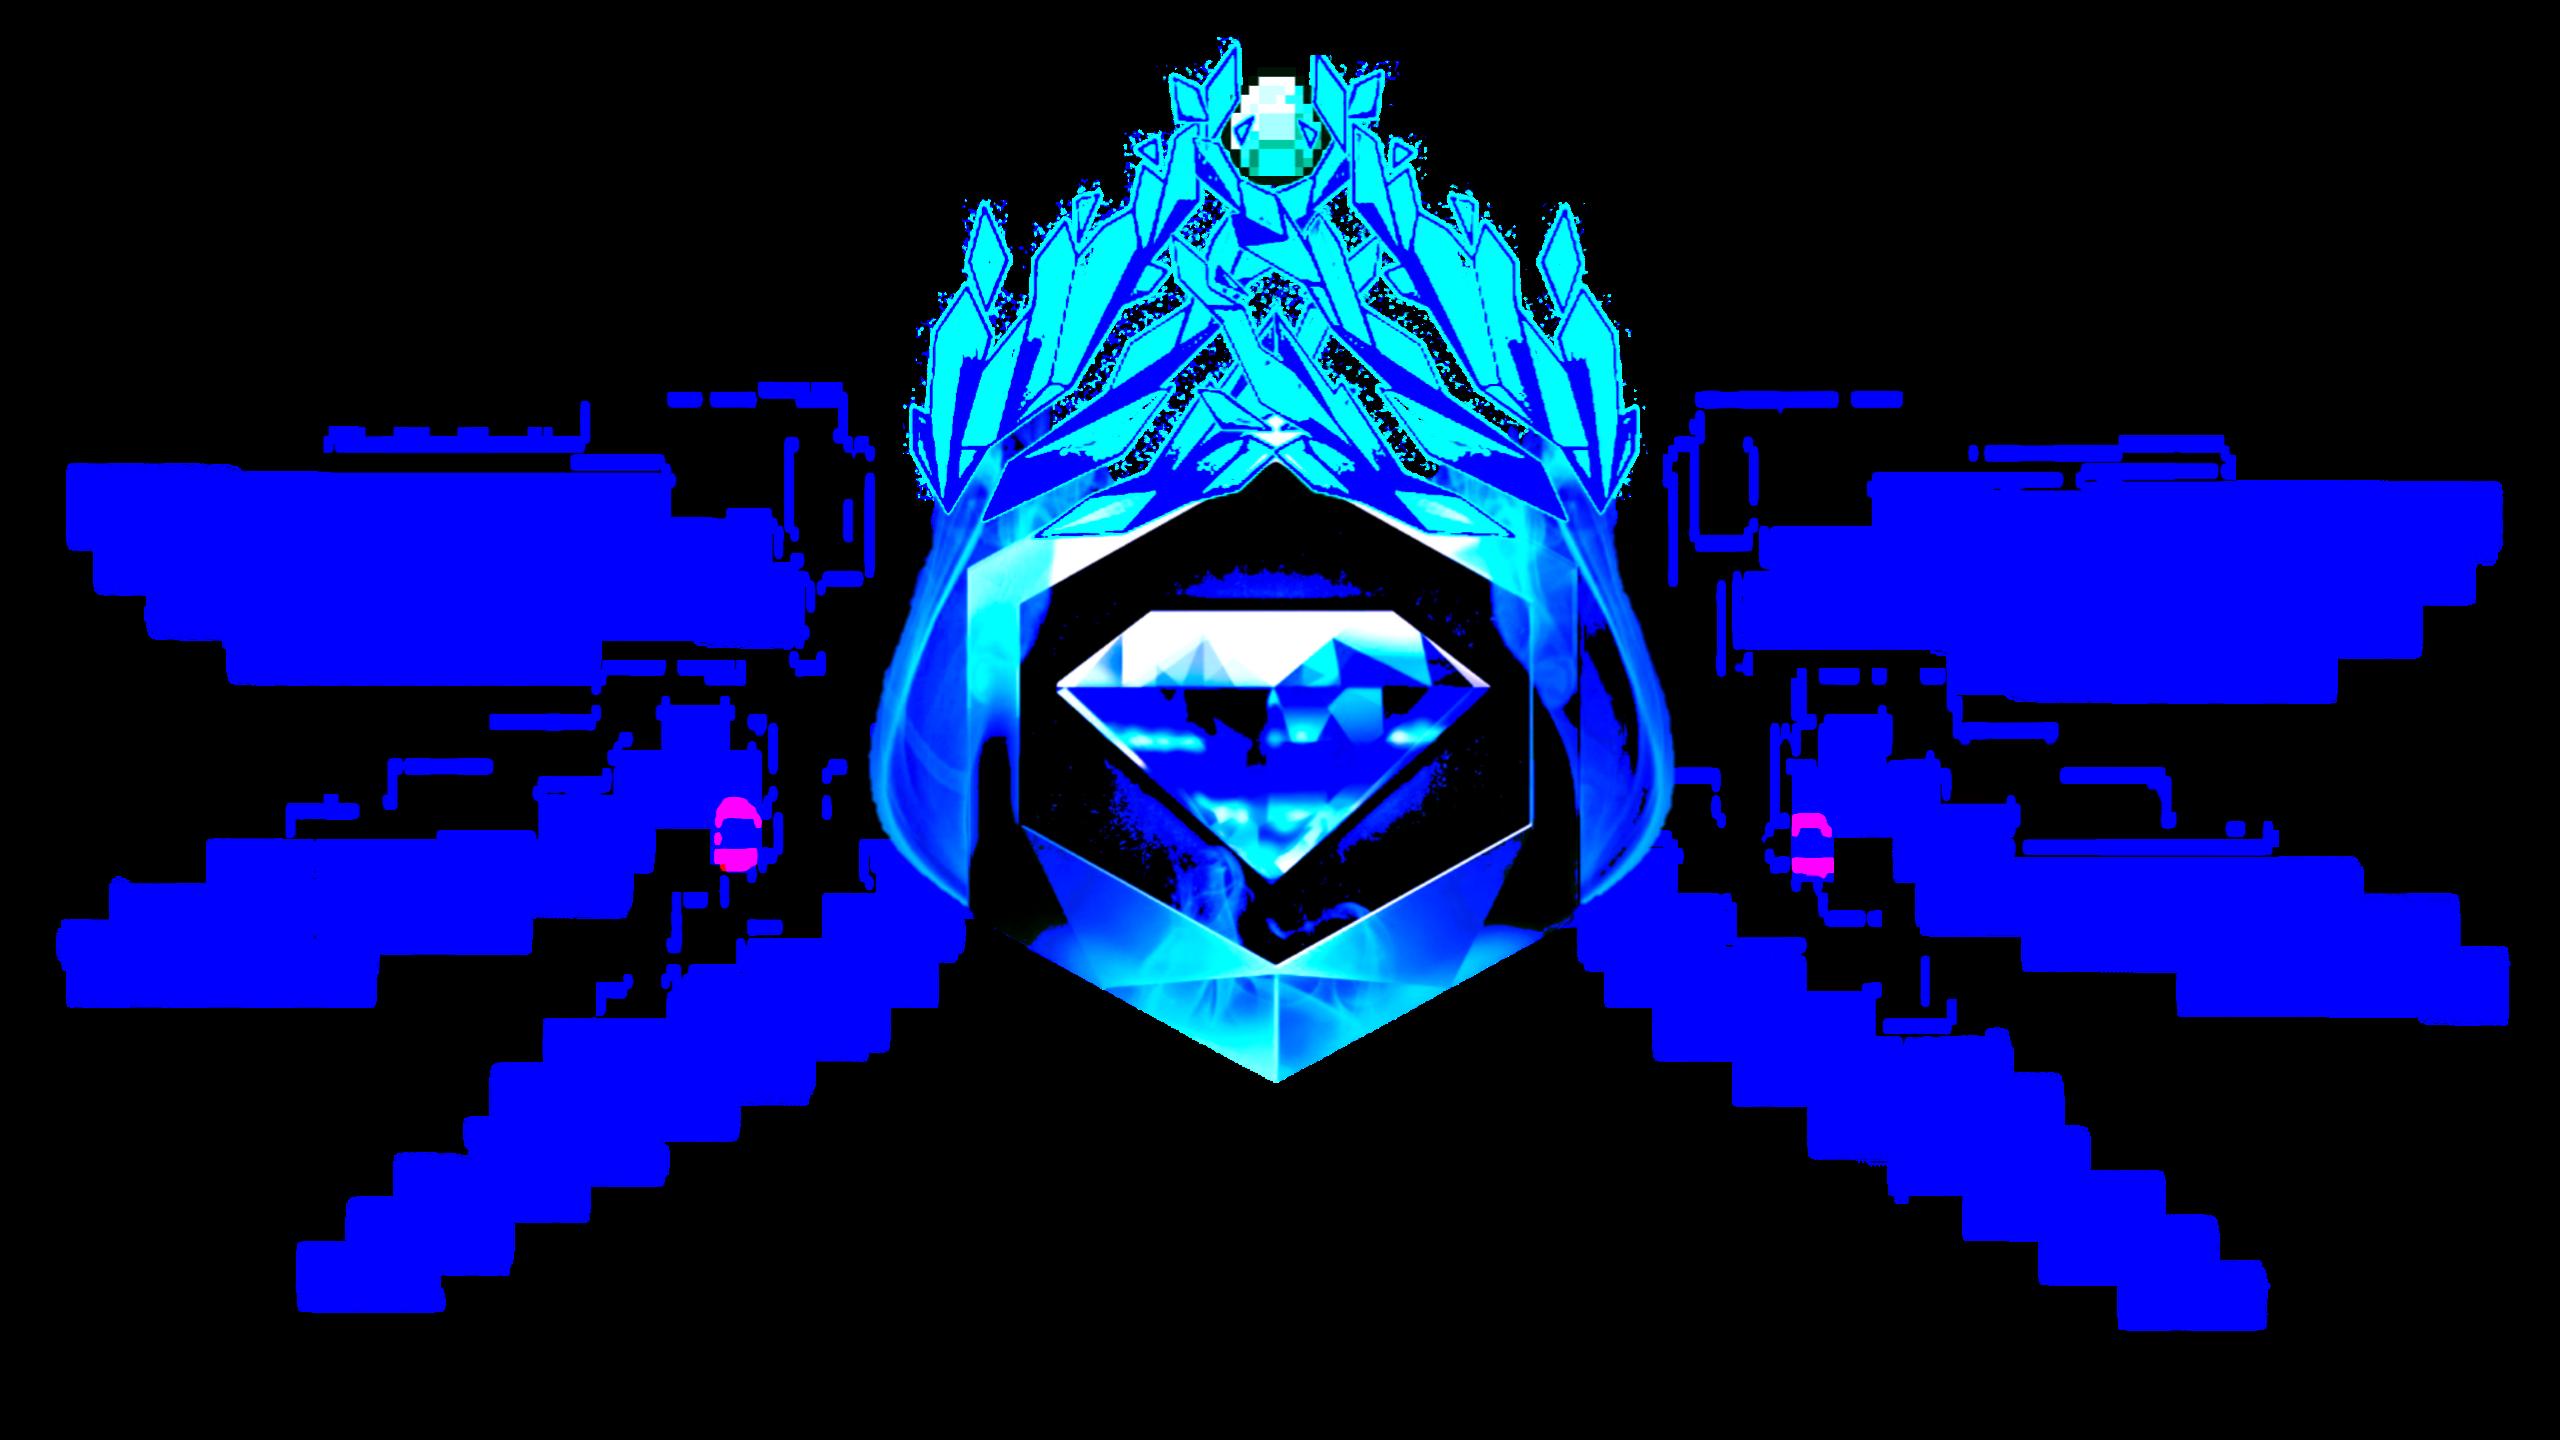 2560x1440 Super Diamond Mega X